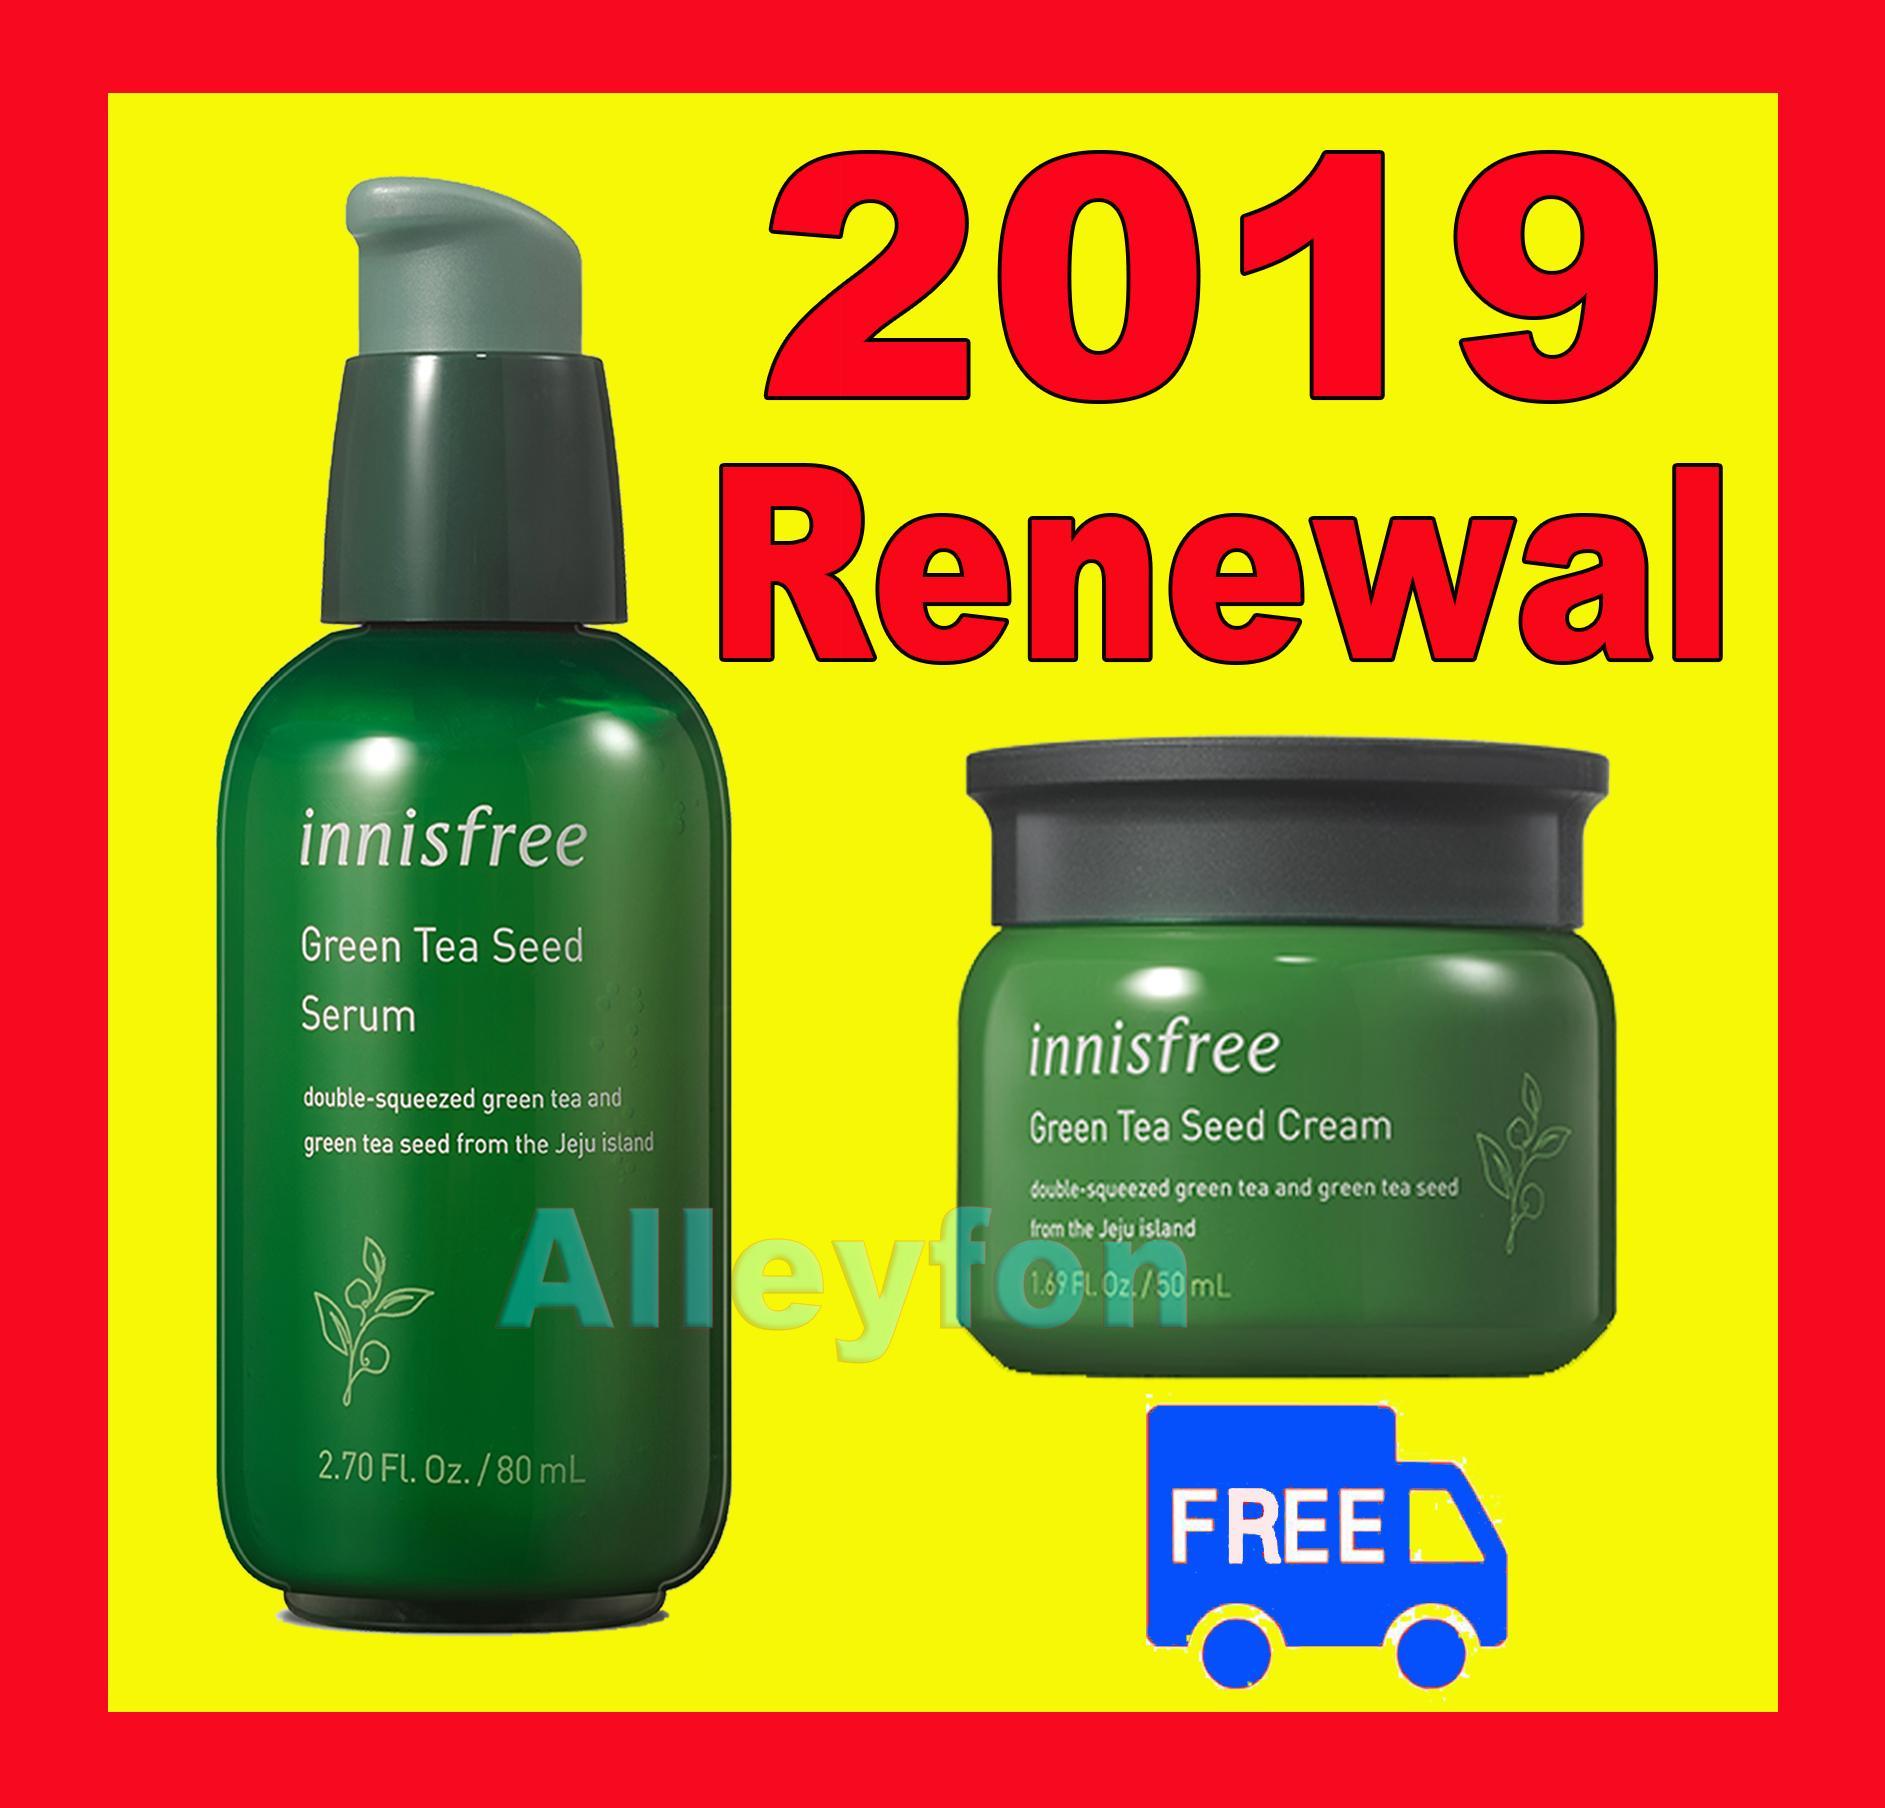 Innisfree Green Tea Seed Serum 2019 Renewal Expiry 2021/2022 By Alleyfon.